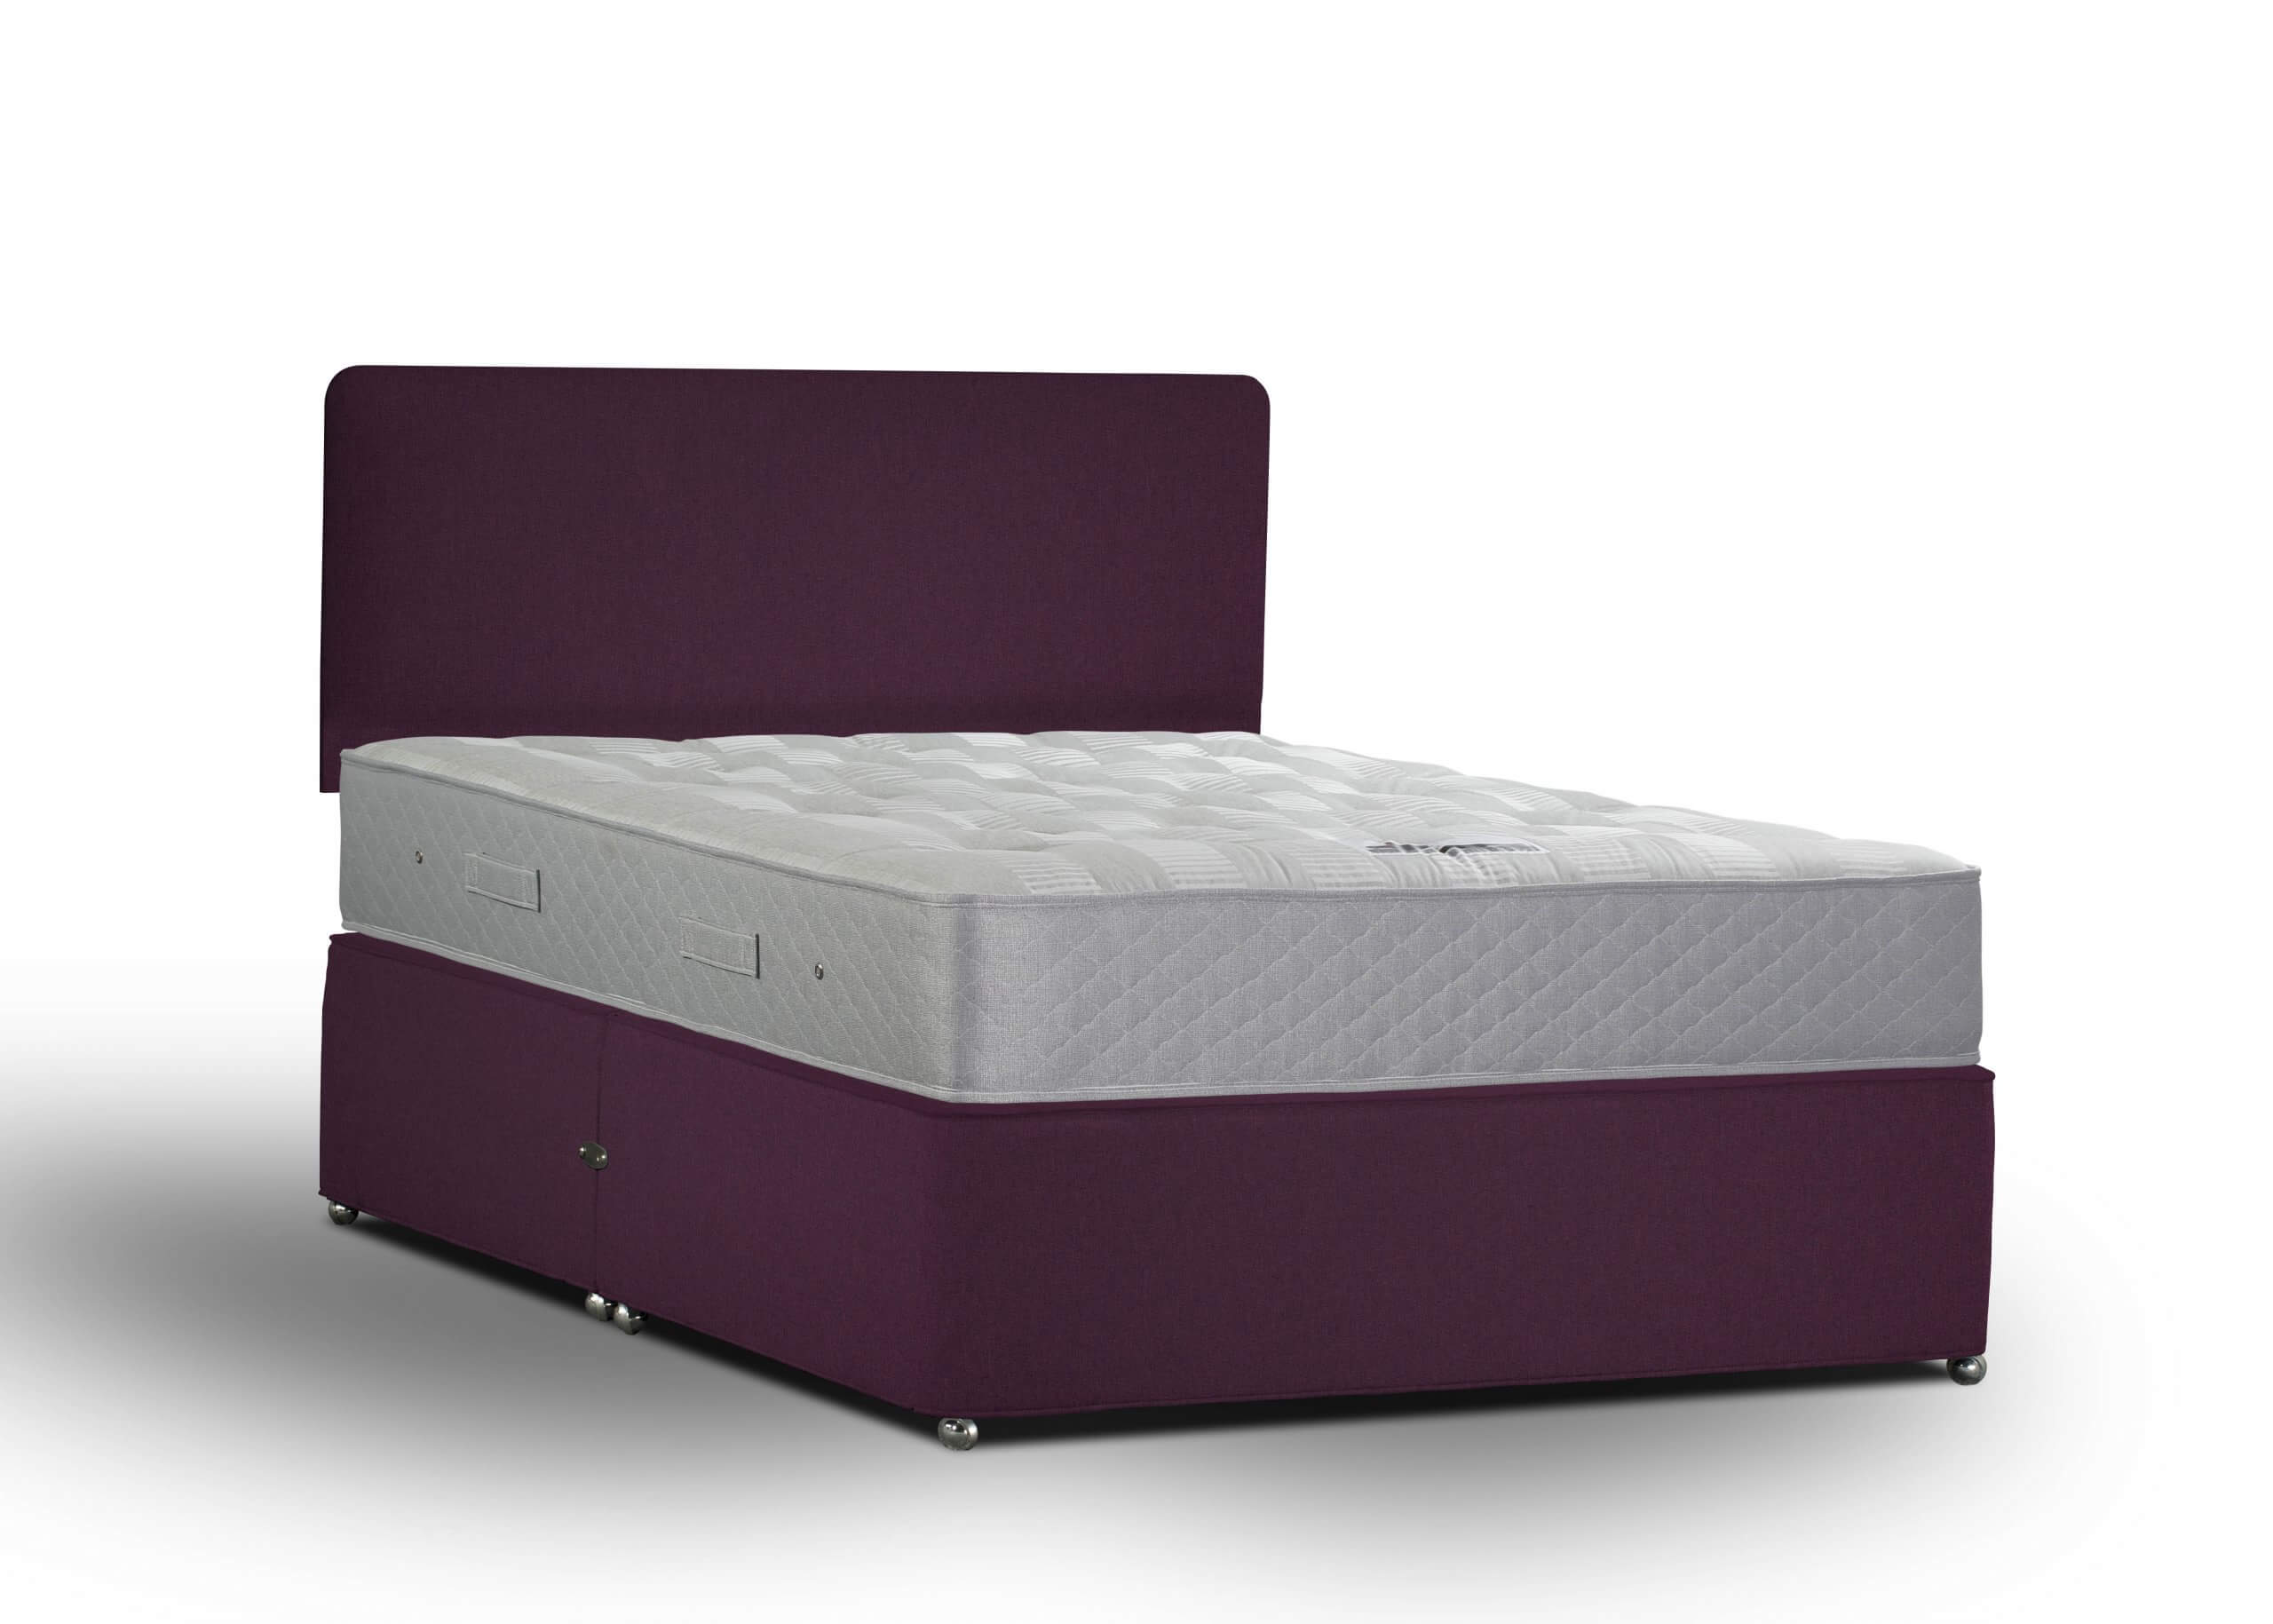 Sleepeezee Hotel Comfort Mattress